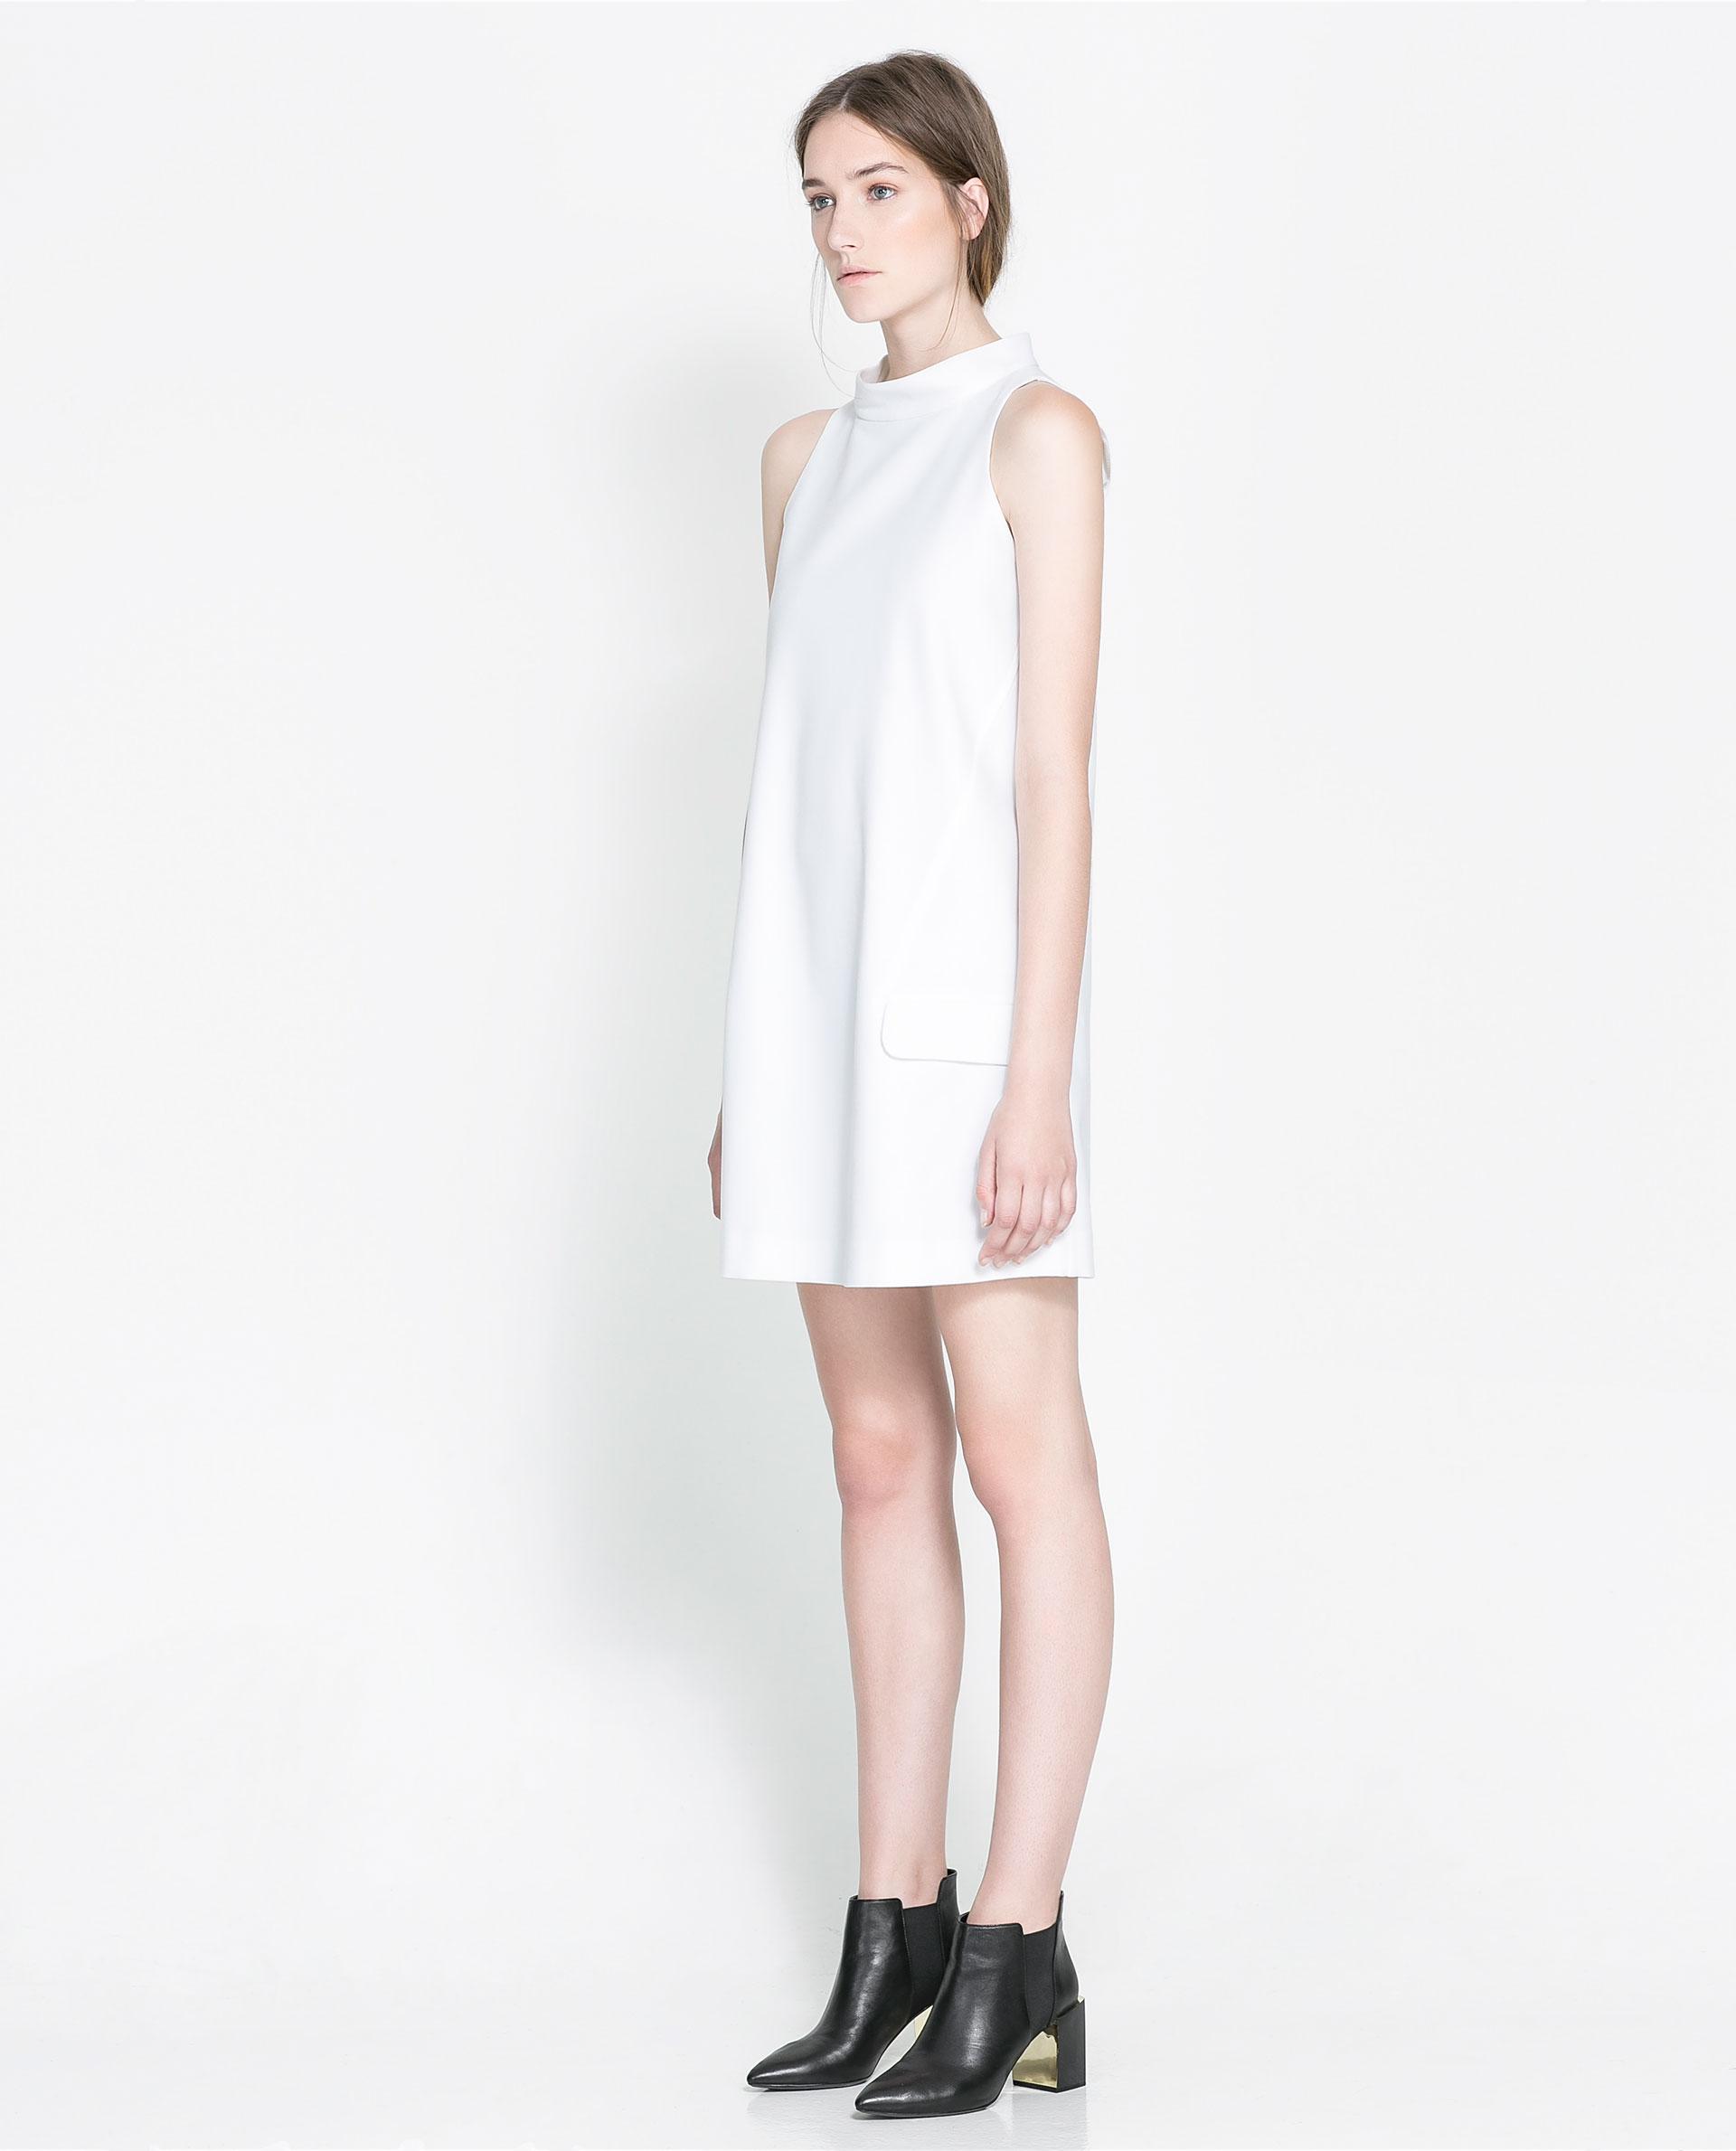 White Cocktail Dresses Zara 6